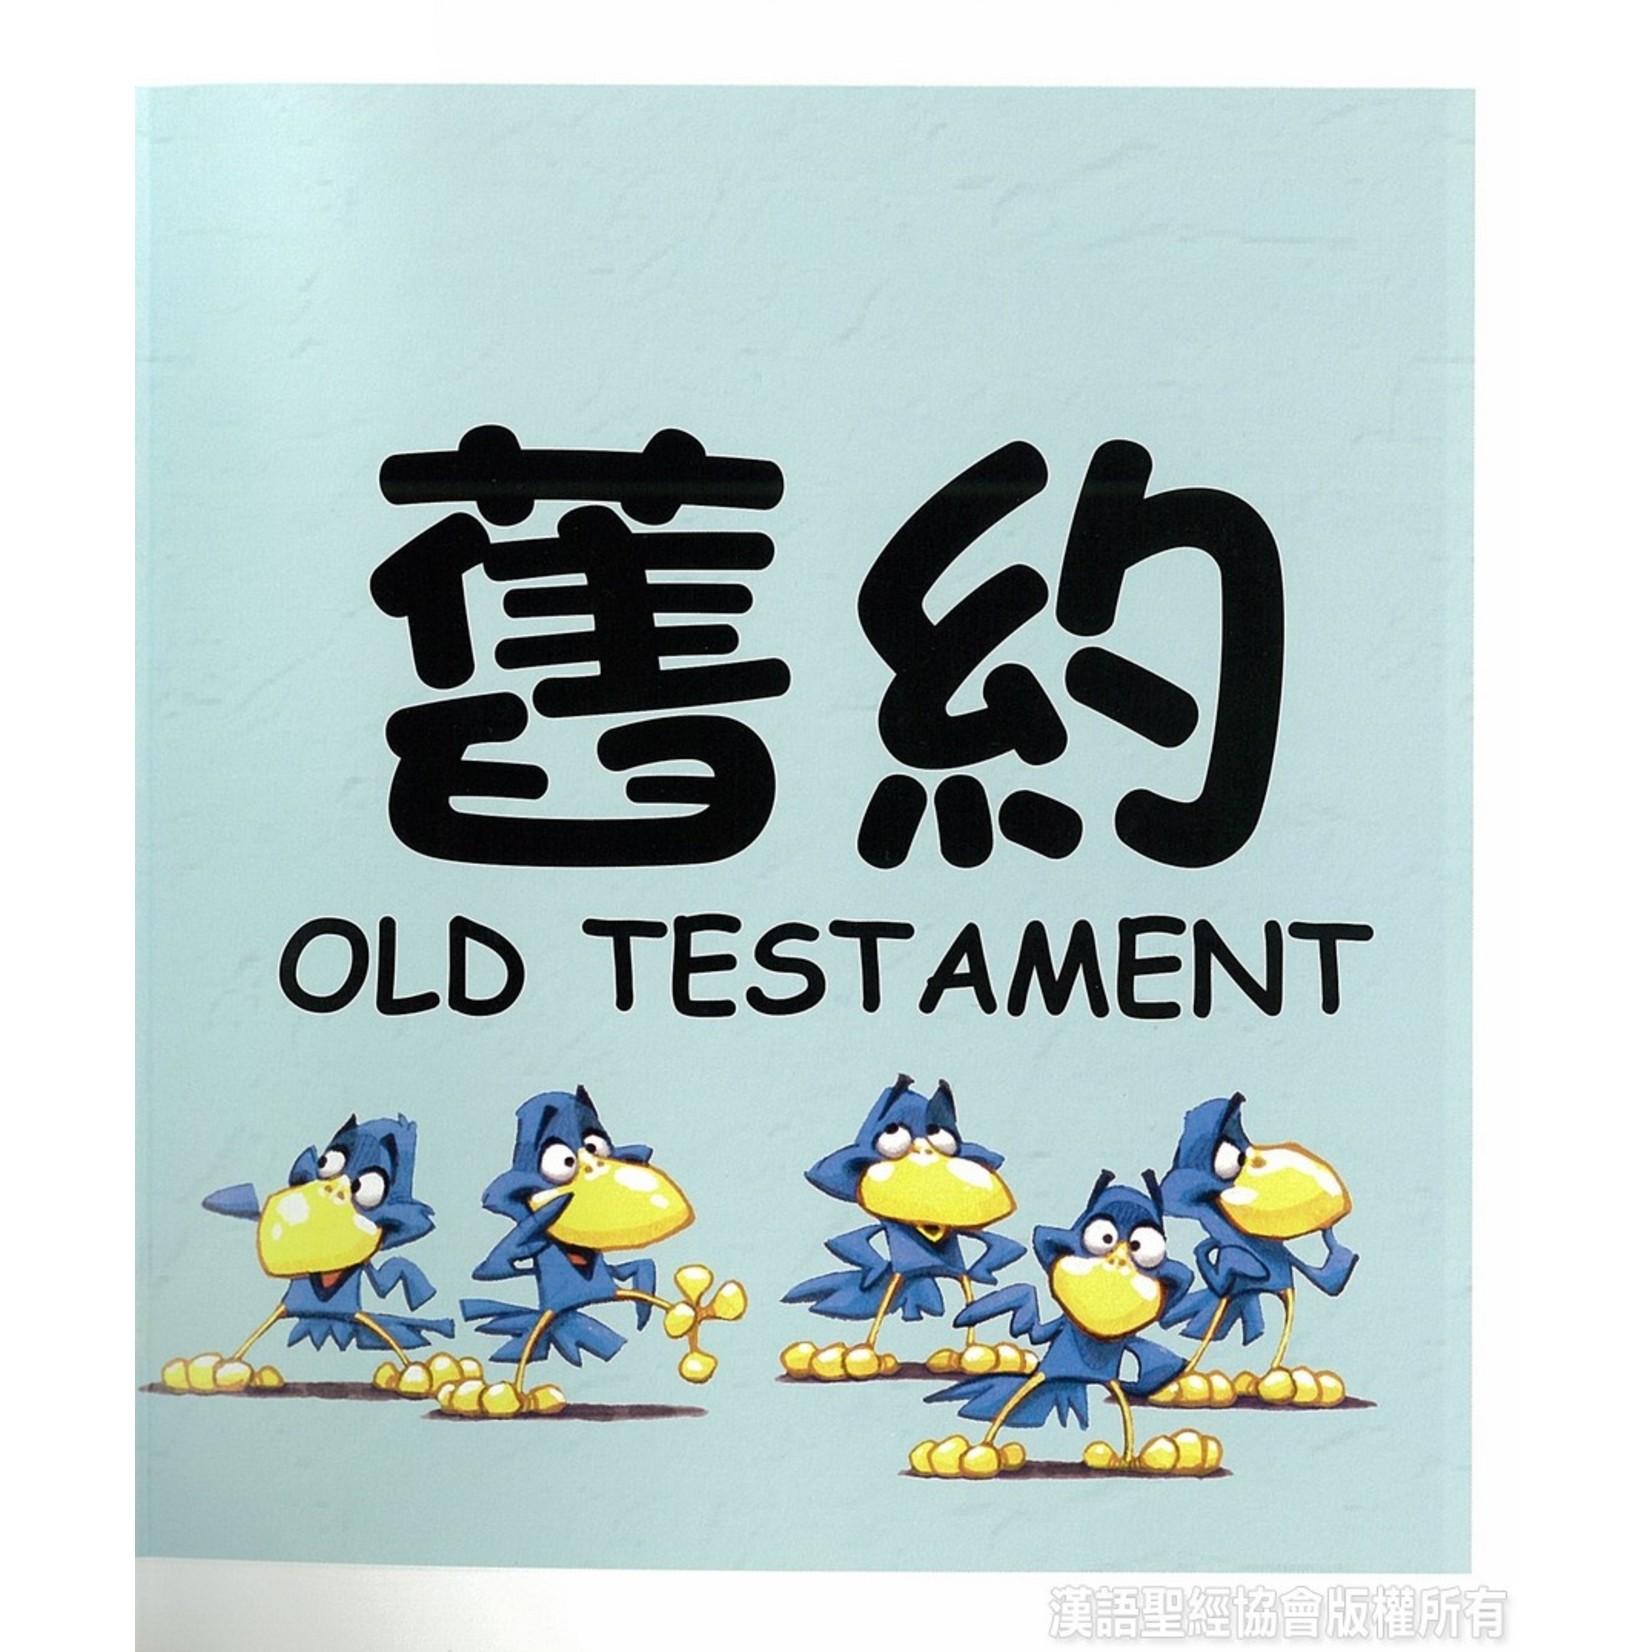 漢語聖經協會 Chinese Bible International 圖圖聖經:看圖說聖經故事(中英對照)(繁體) See With Me Bible-The Bible Told in Pictures